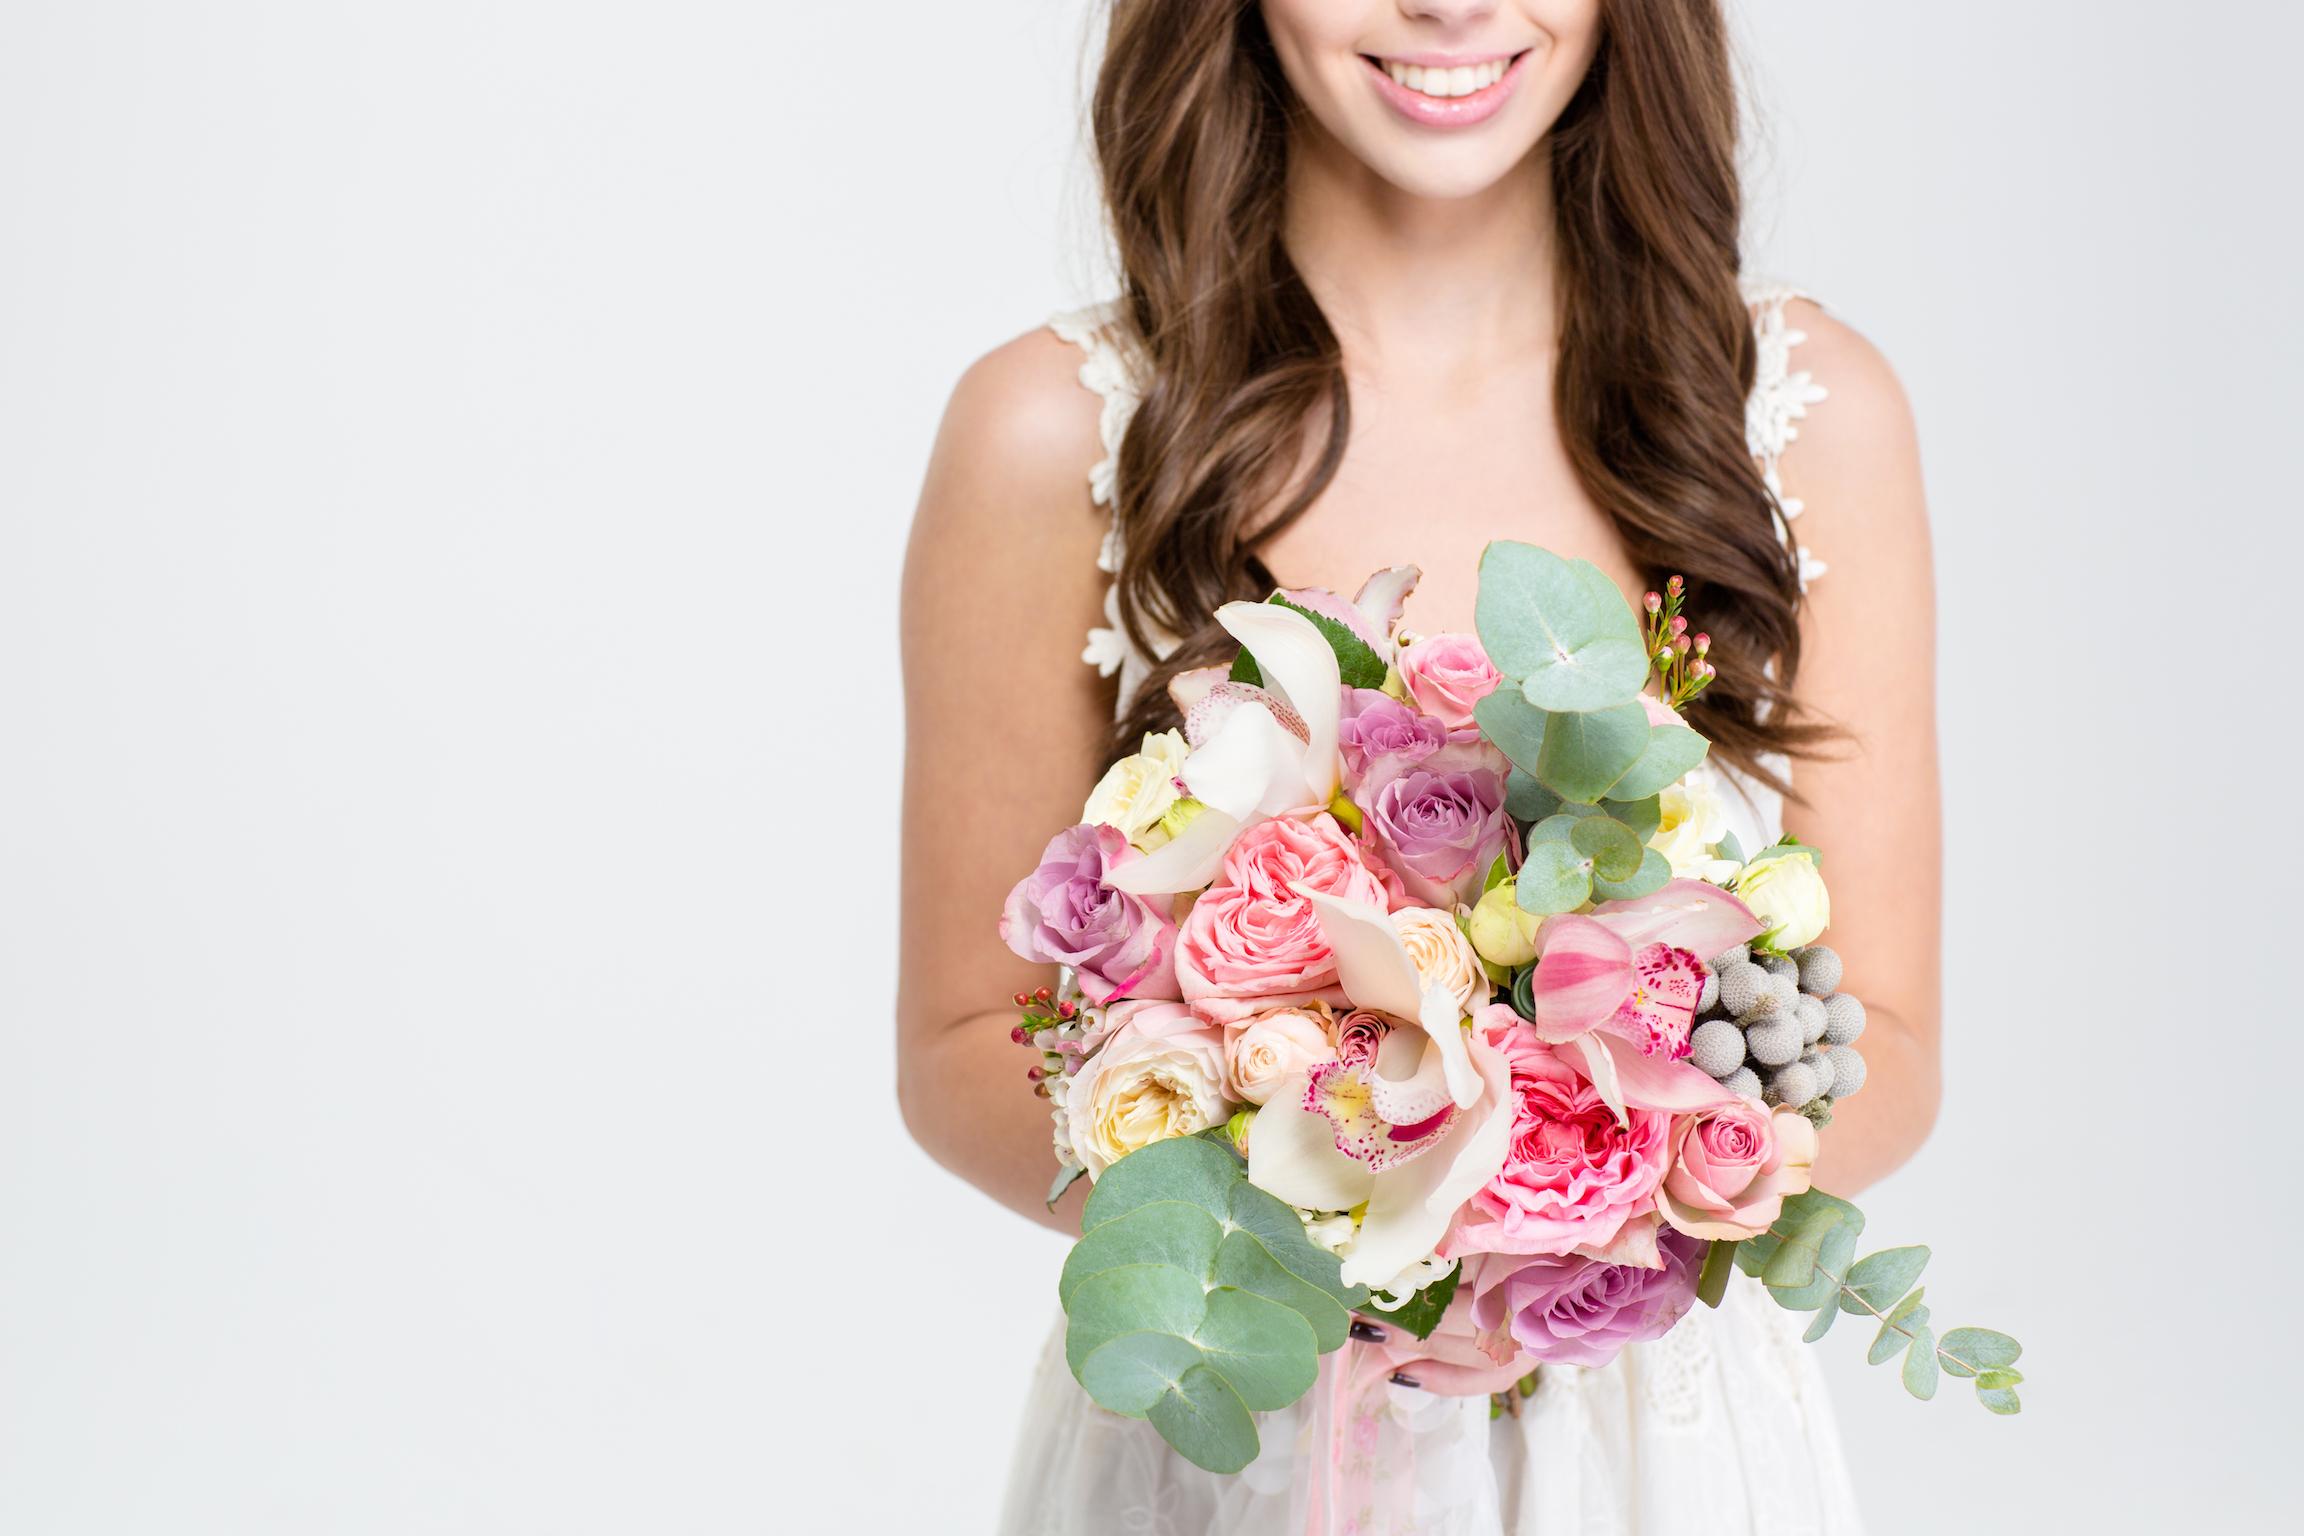 Bride with Bouquet - lr.jpg